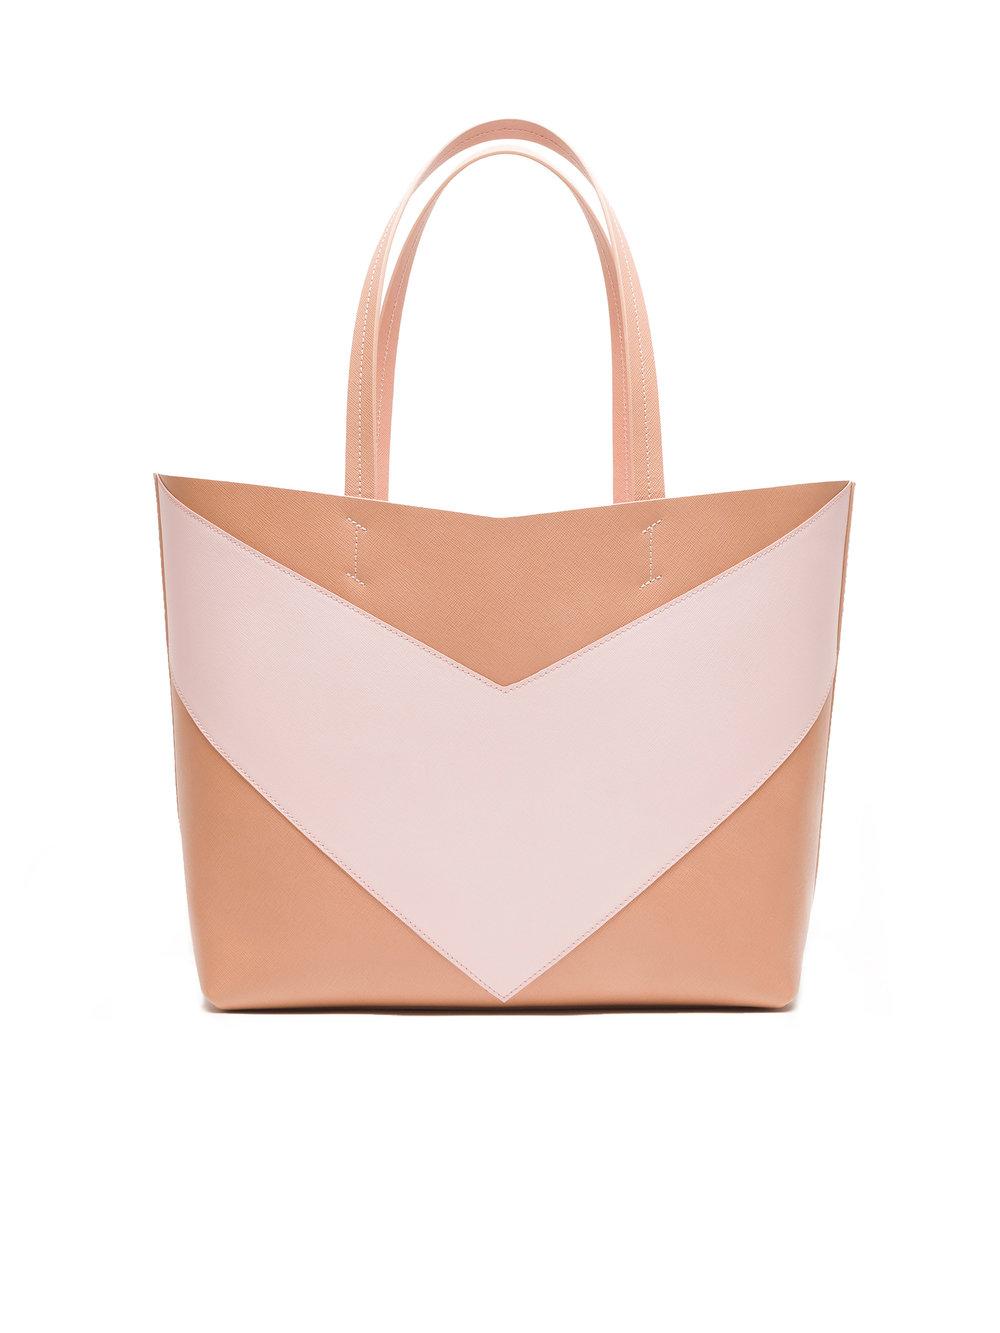 Pragmantica L - Nude/Soft Pink - Nude saffiano leather & Soft Pink saffiano leatherCyclamen suede interior with two Internal pocketW 40 x H 30 x D 16,5 cm